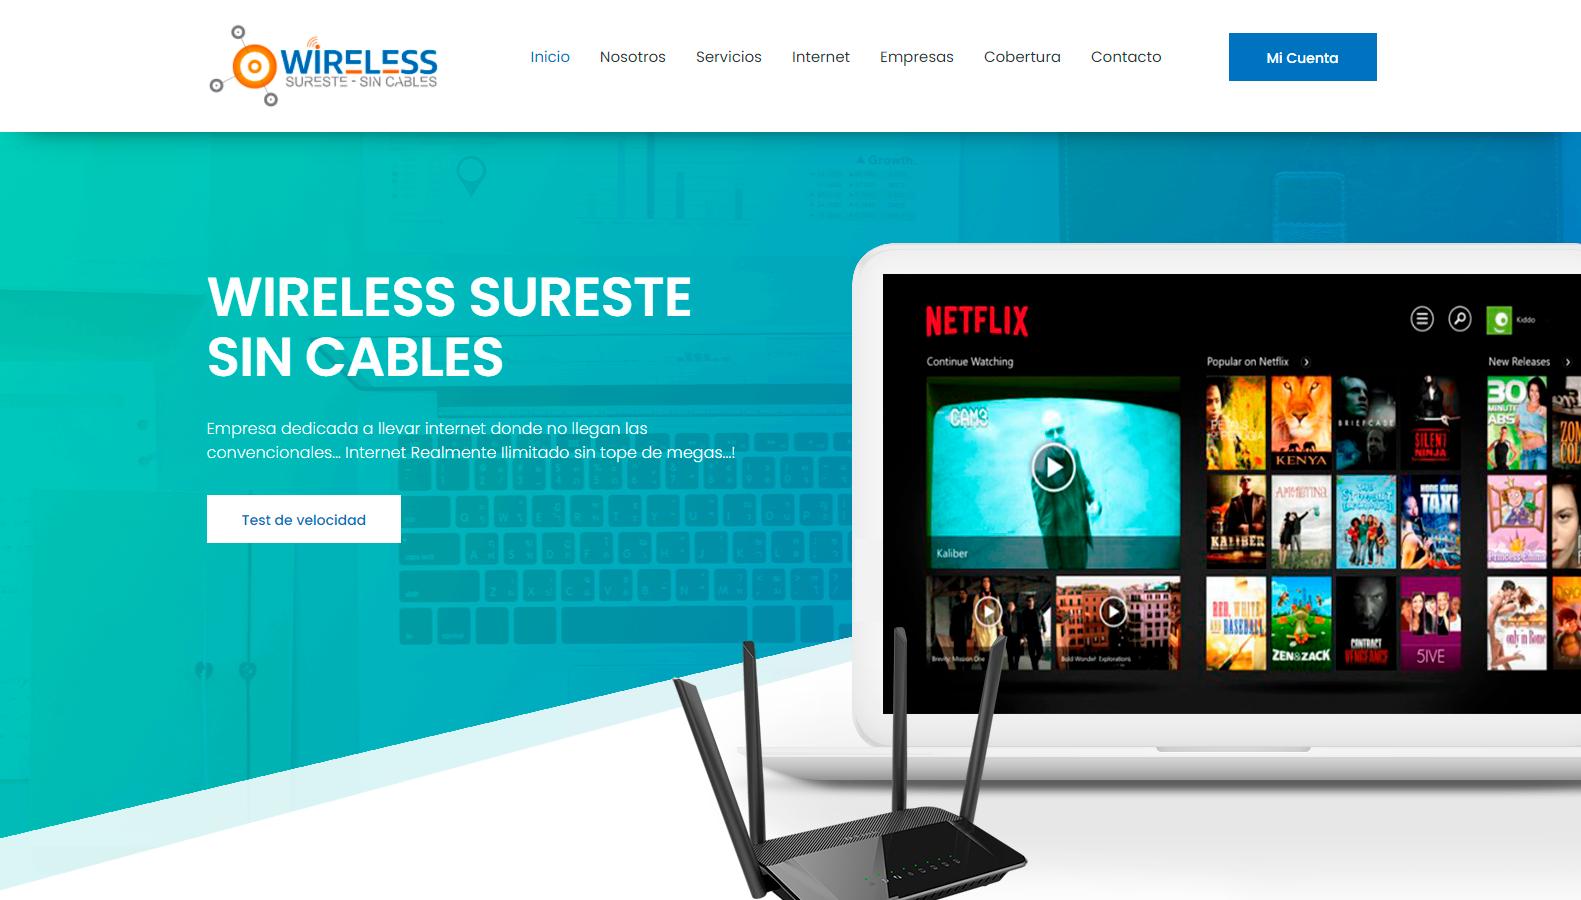 Imagen Wireless Sureste